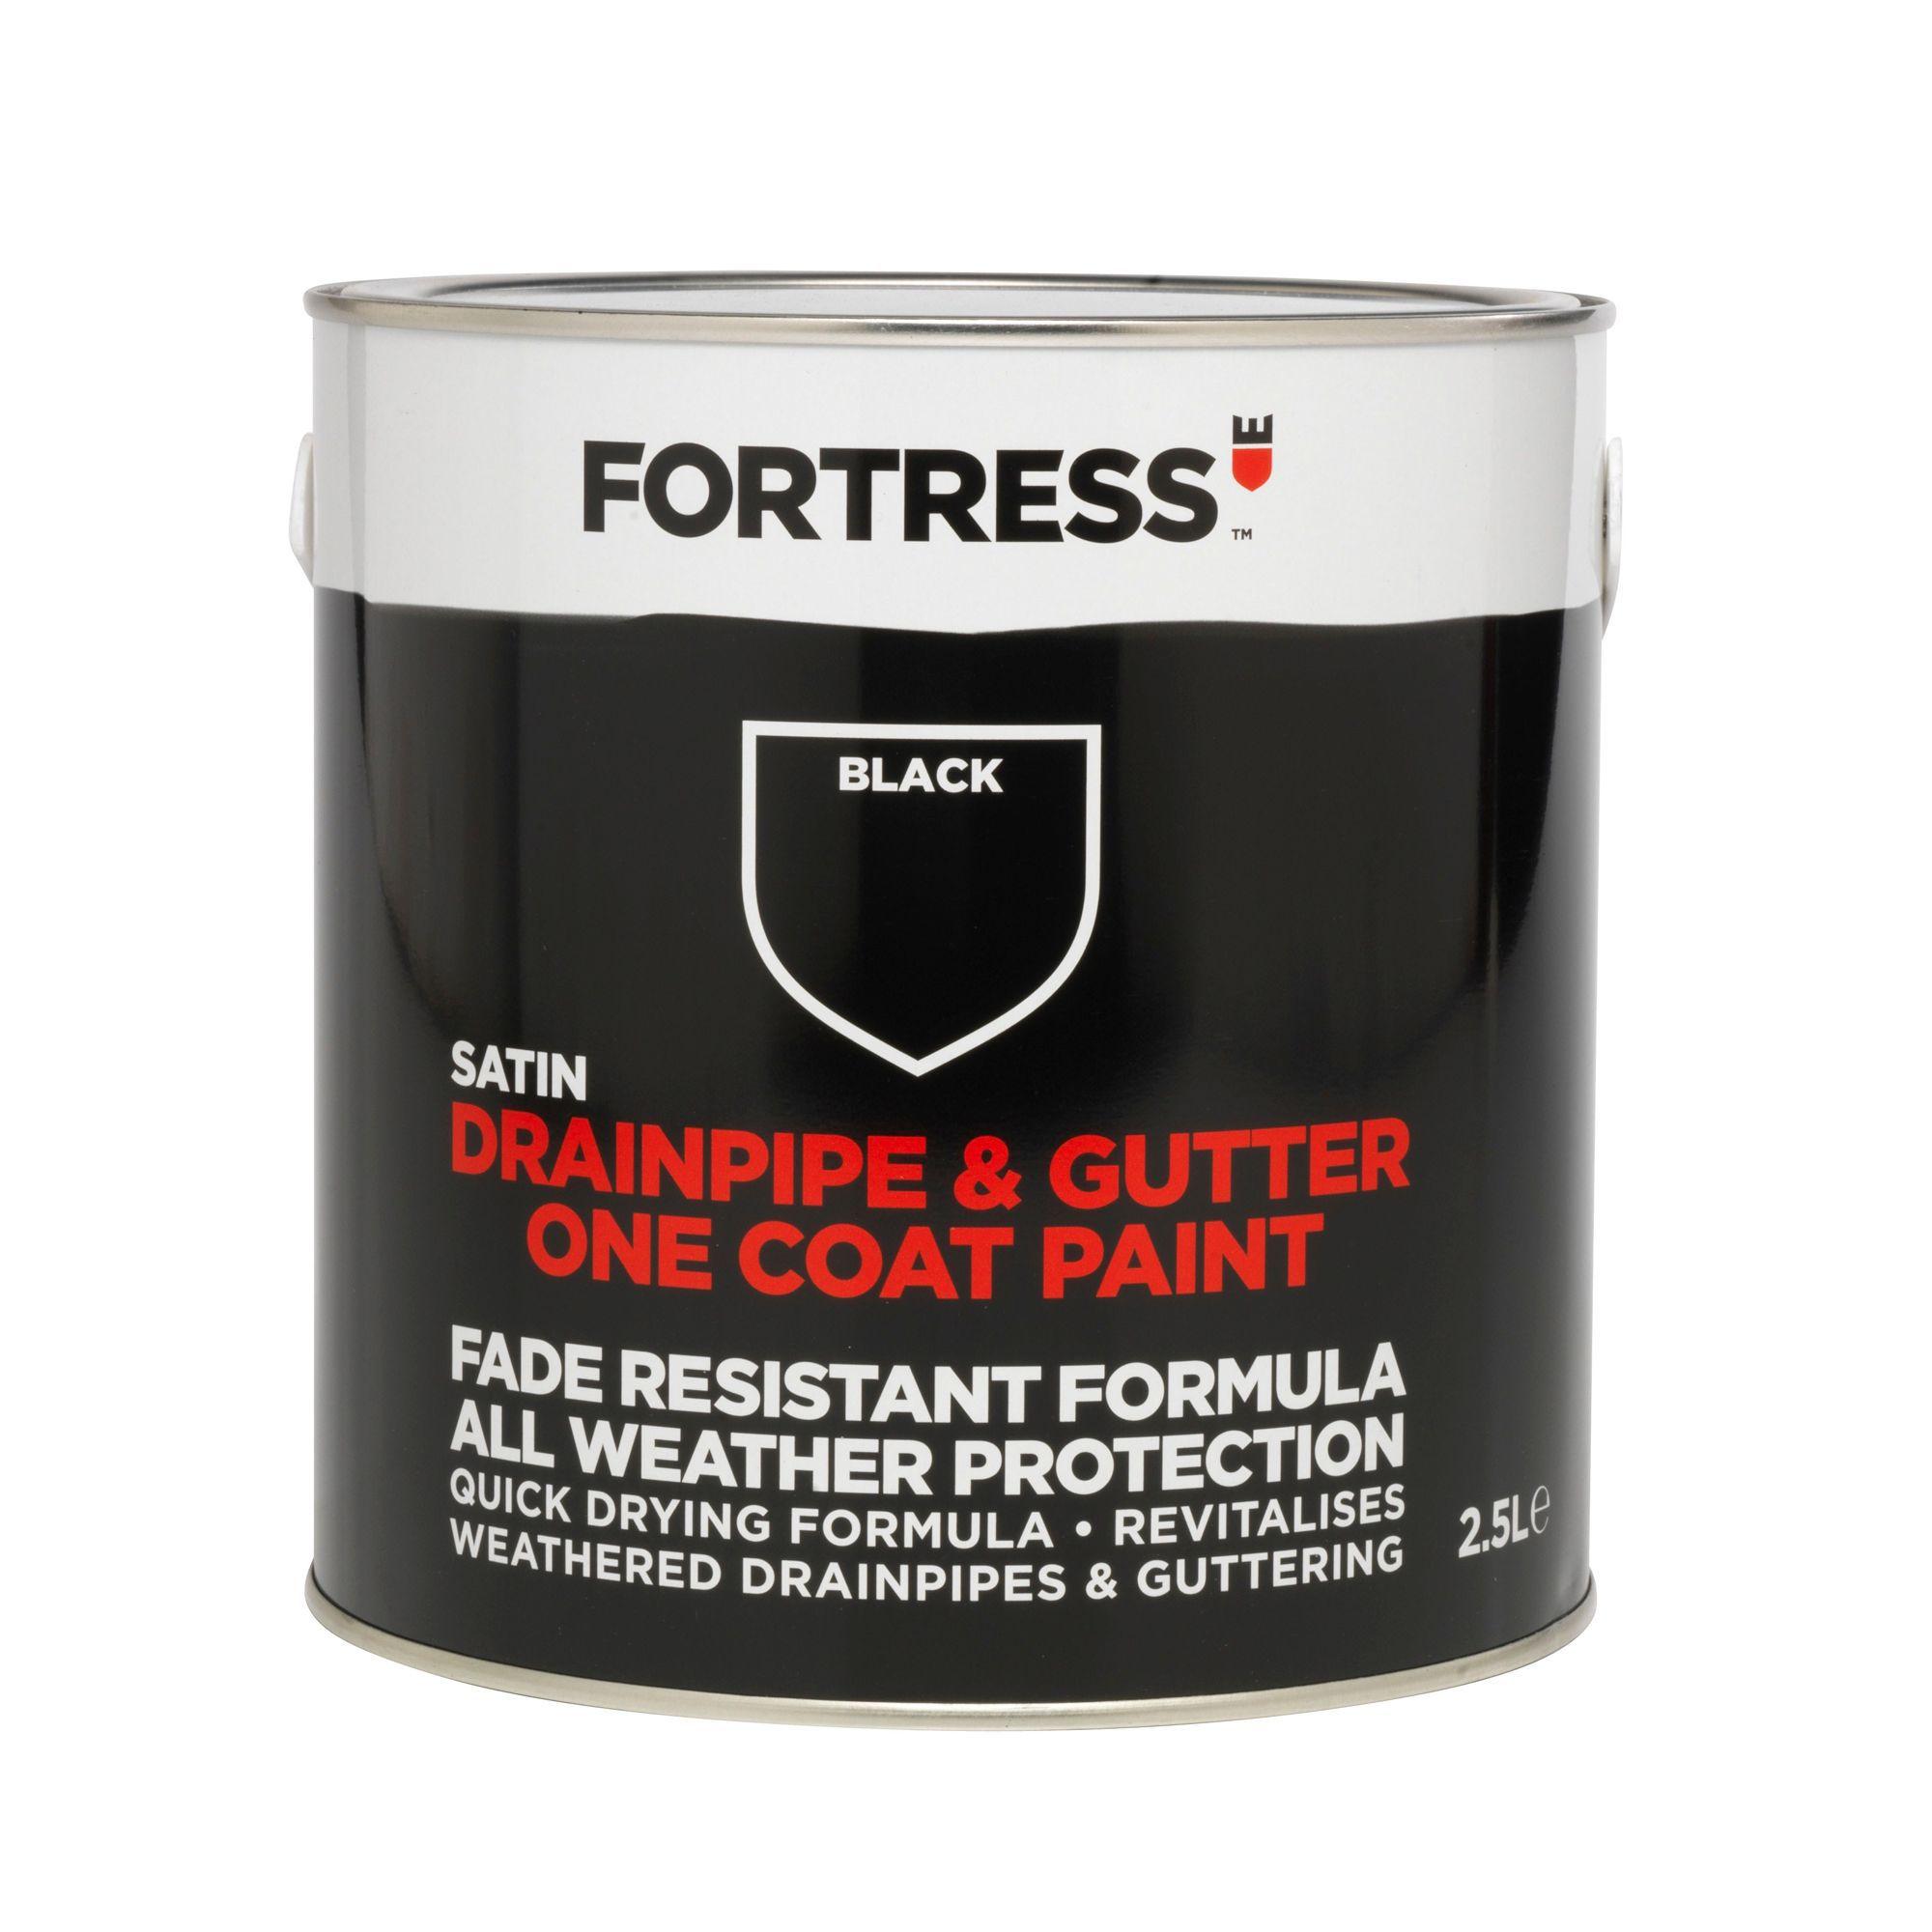 fortress black satin drainpipe gutter paint 2 5l departments diy at b q. Black Bedroom Furniture Sets. Home Design Ideas